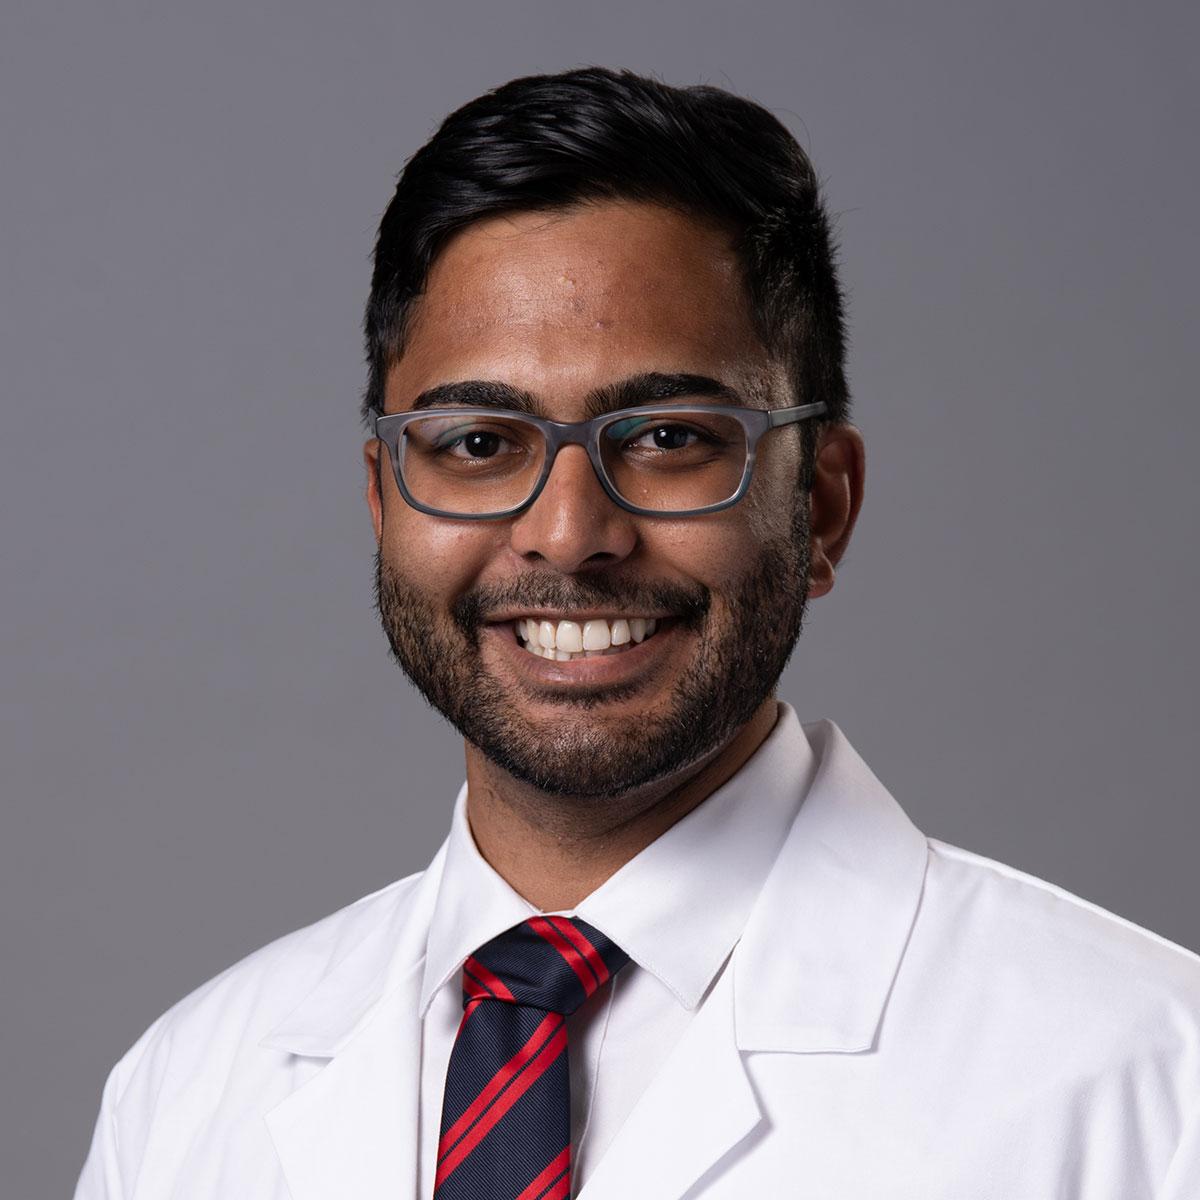 A friendly headshot of Dr. Sandeep Bala